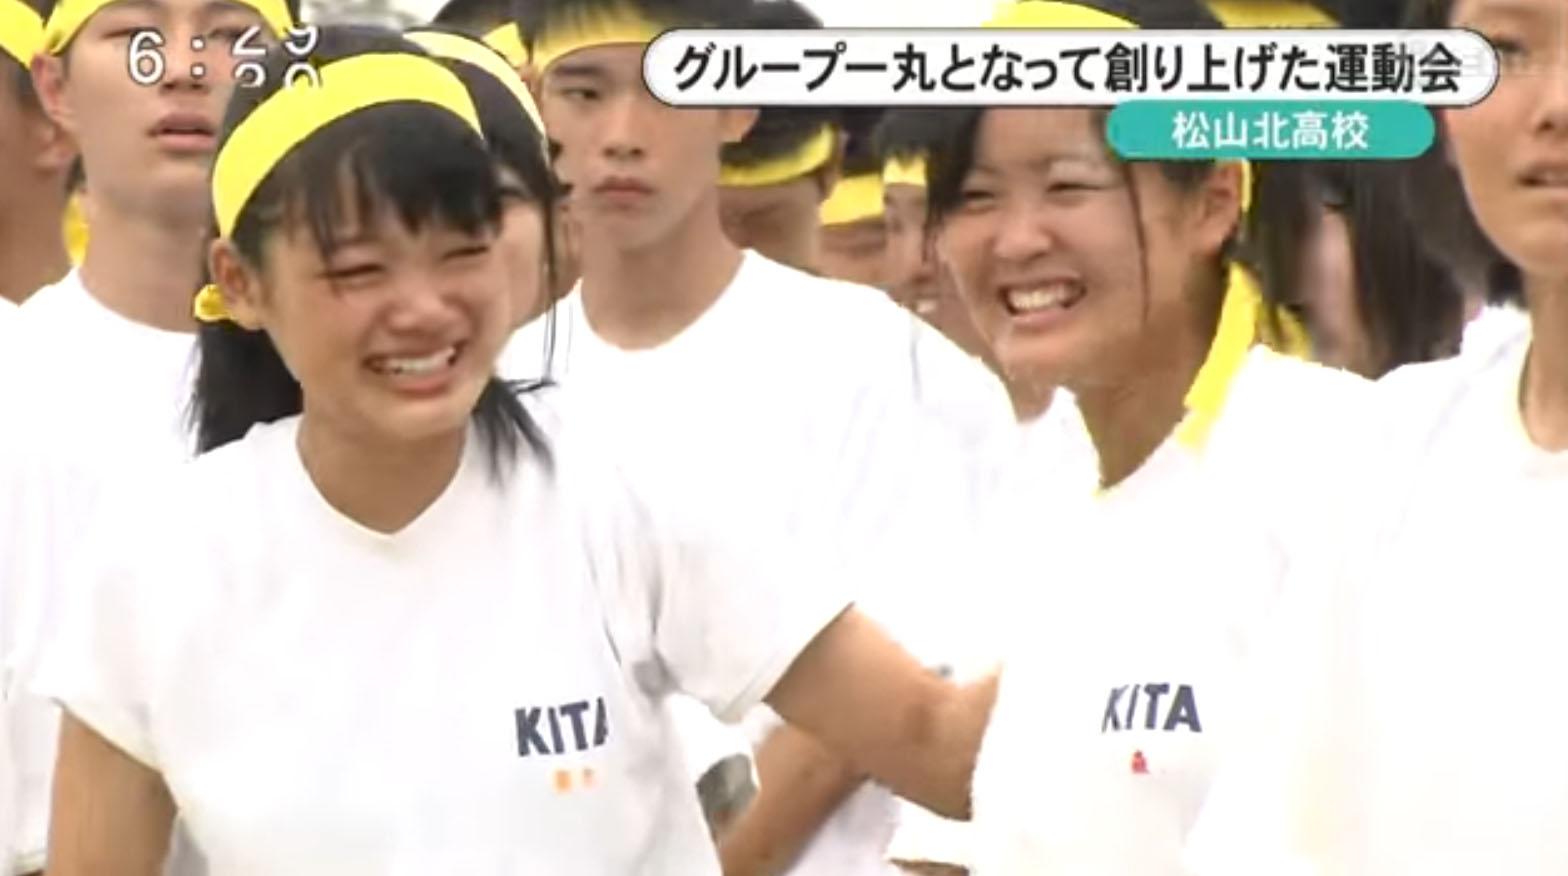 北高の体育祭2015 | 松山北高同...